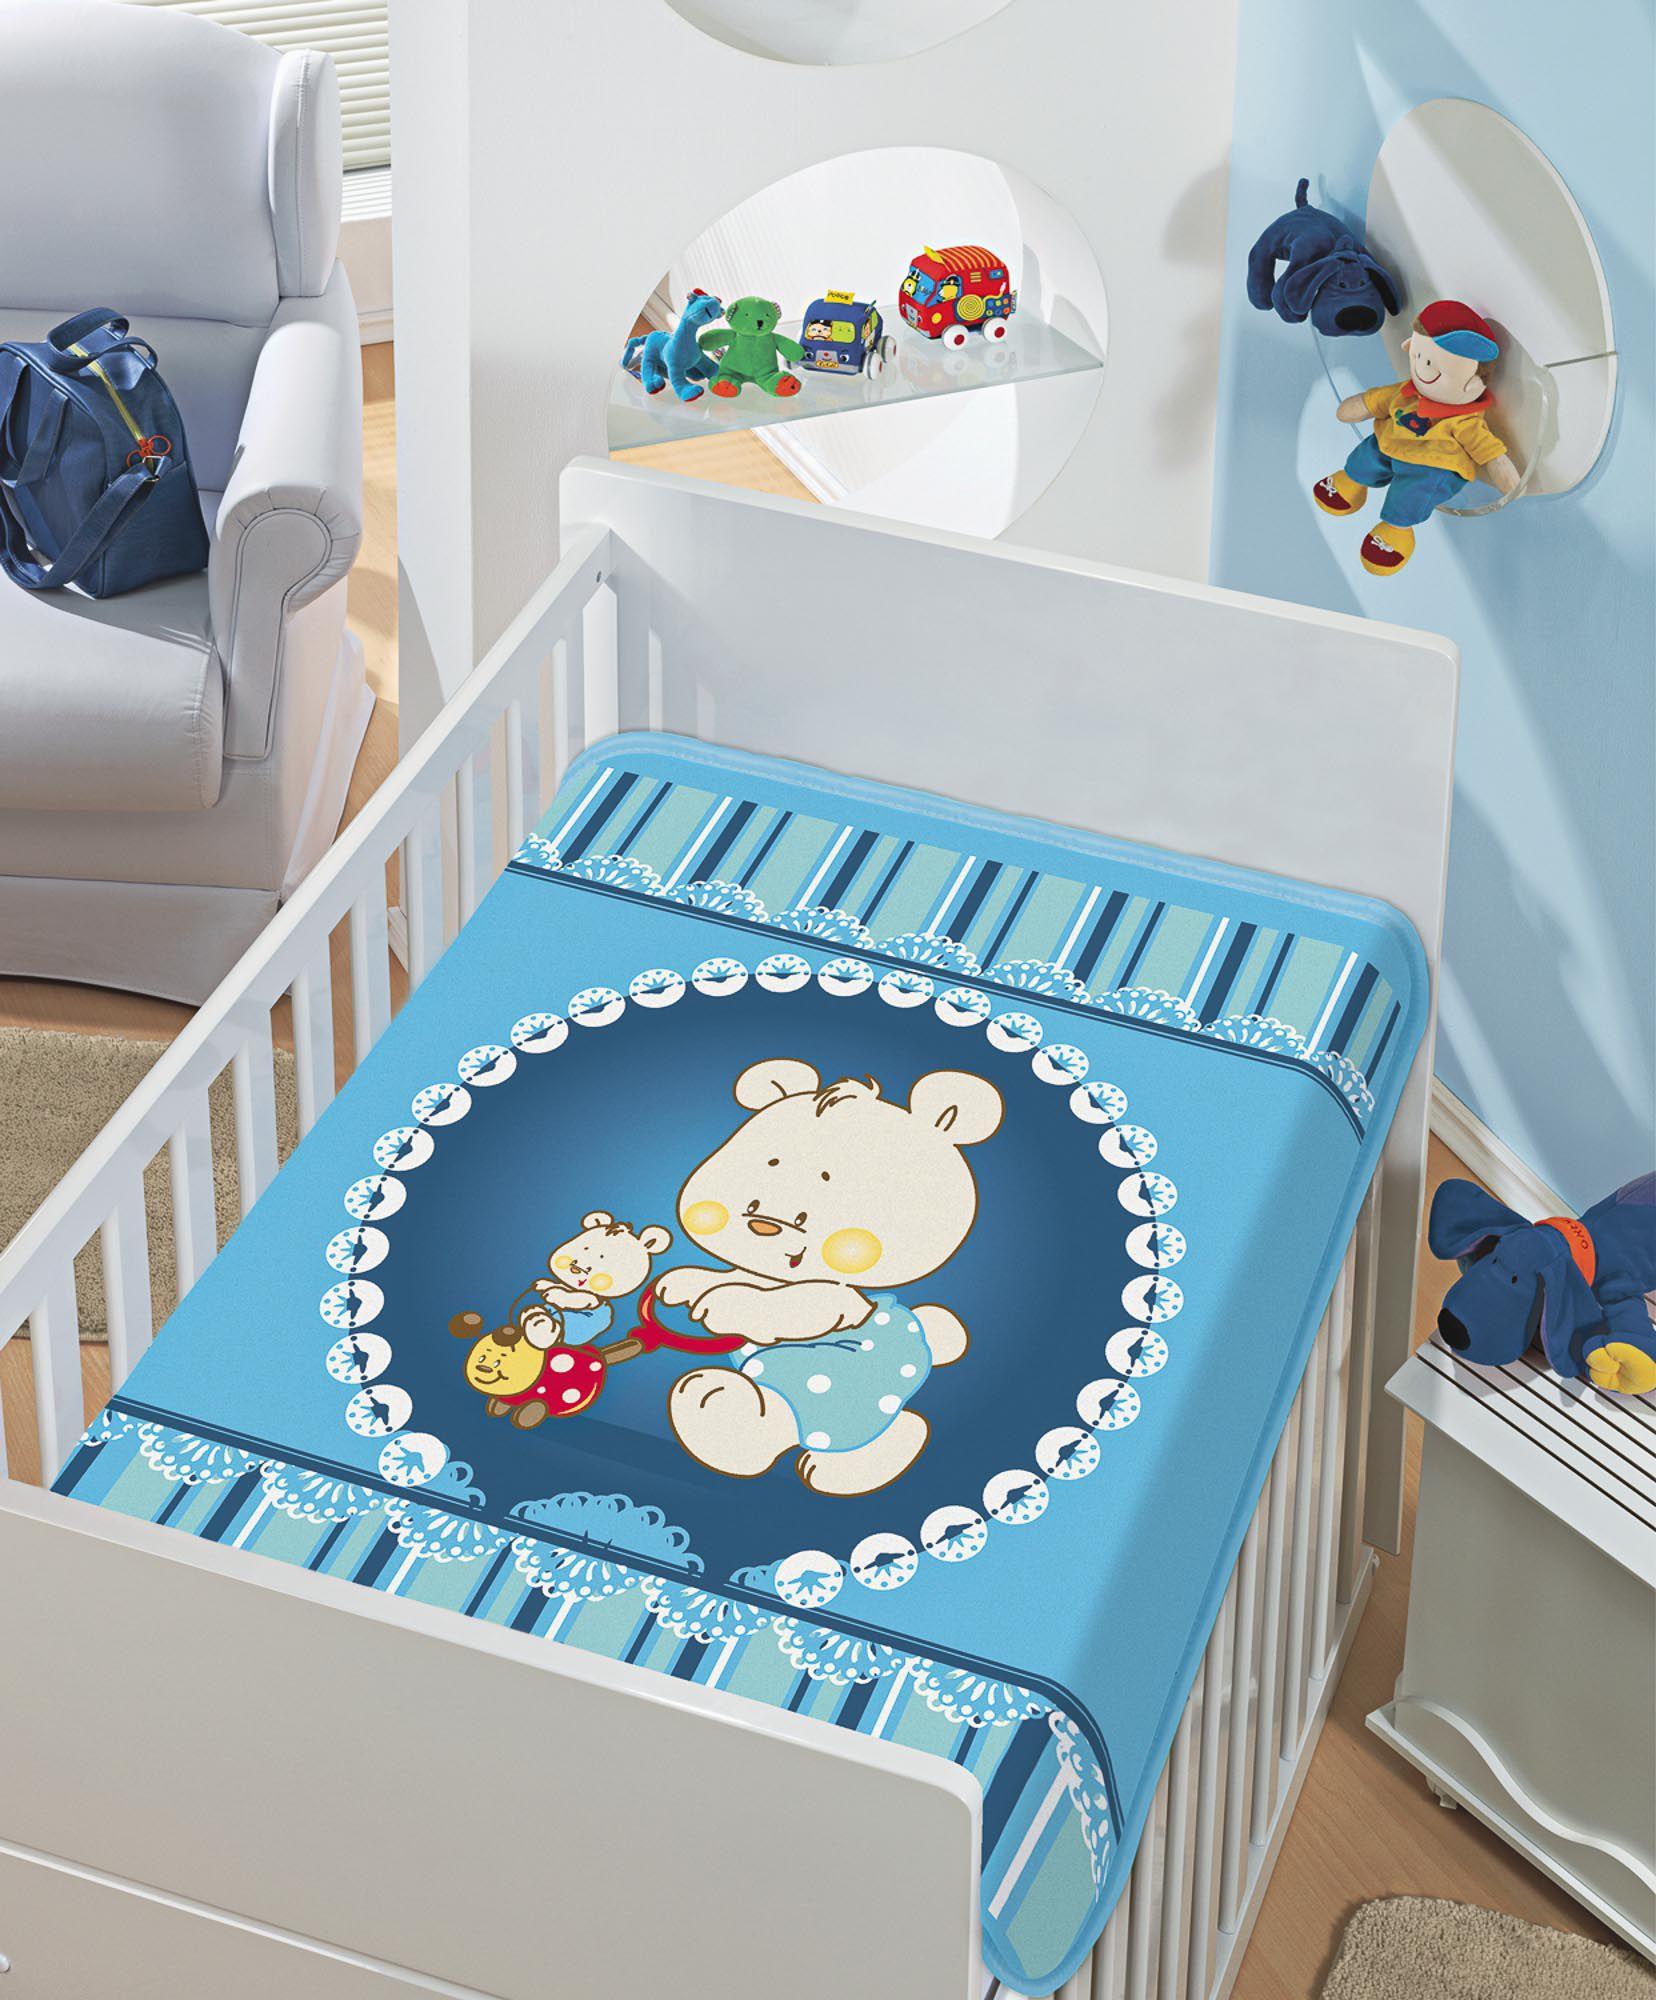 Cobertor Jolitex Raschel Infantil 0,90x1,10m Mamãe e Filhinho Azul